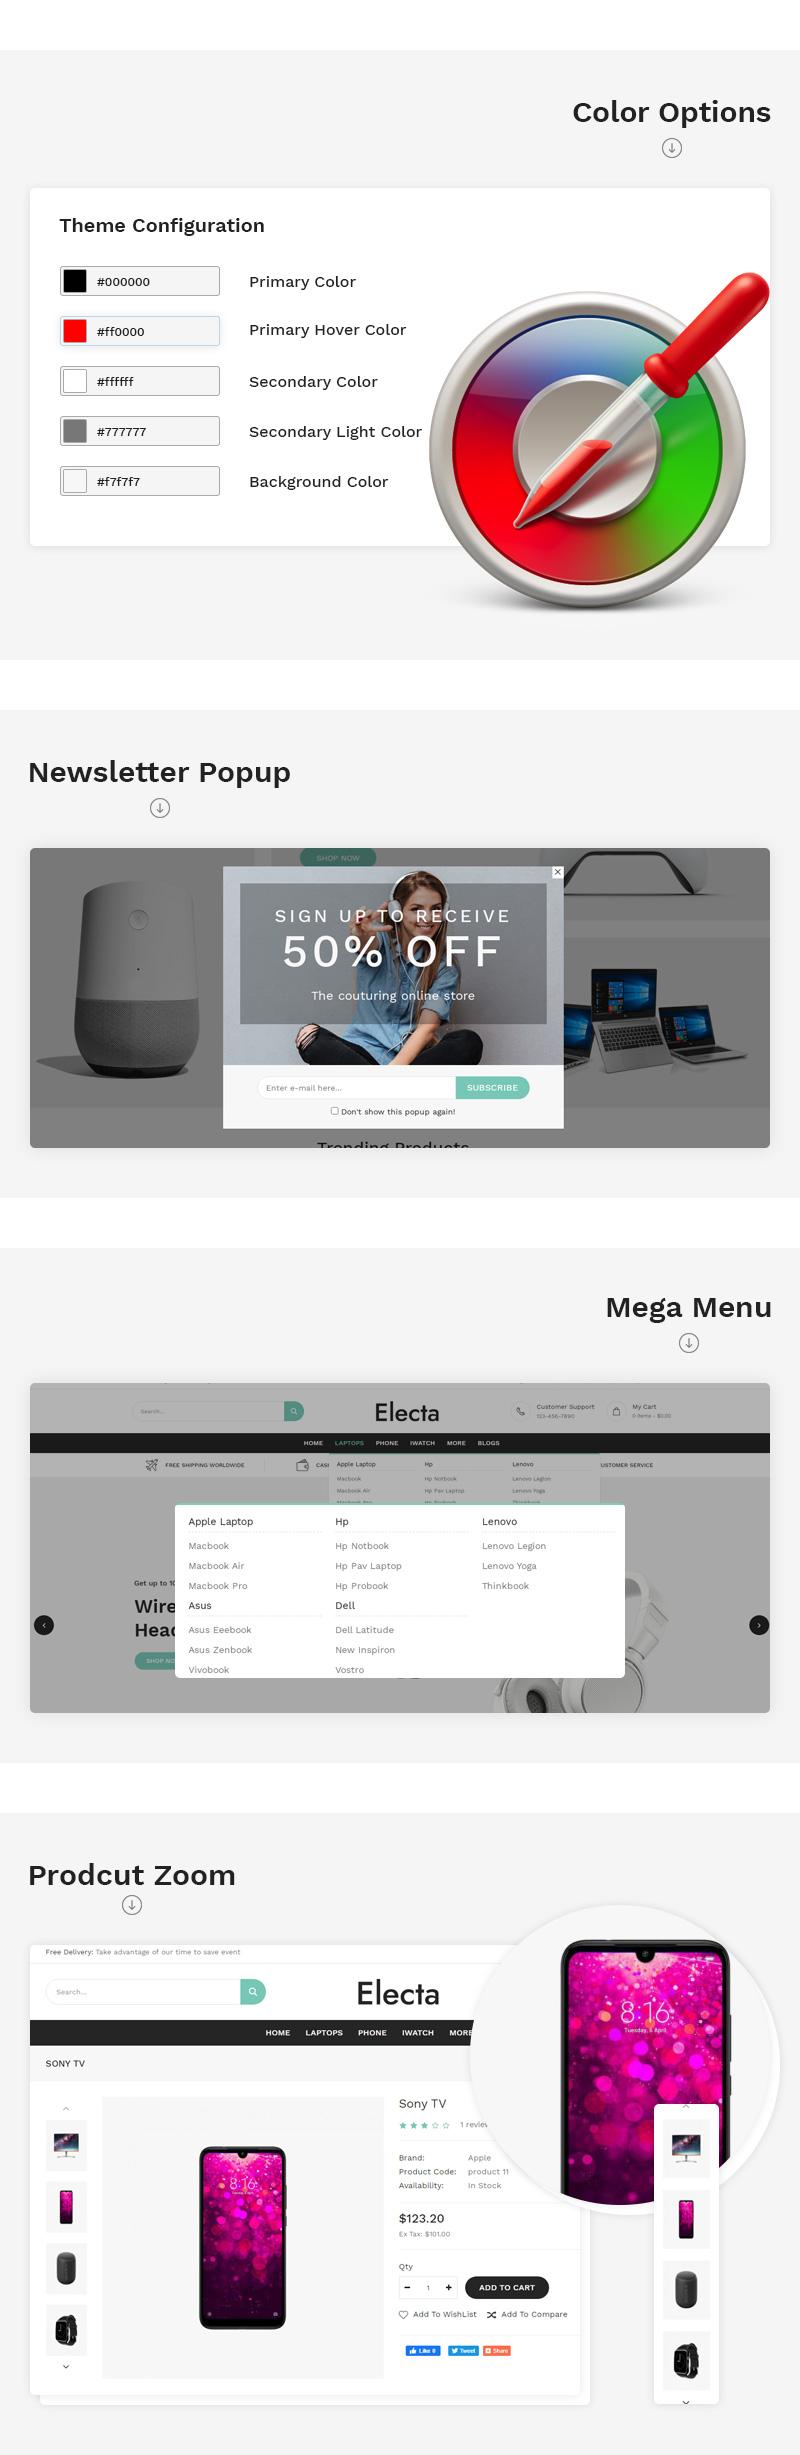 electa-features-3.jpg